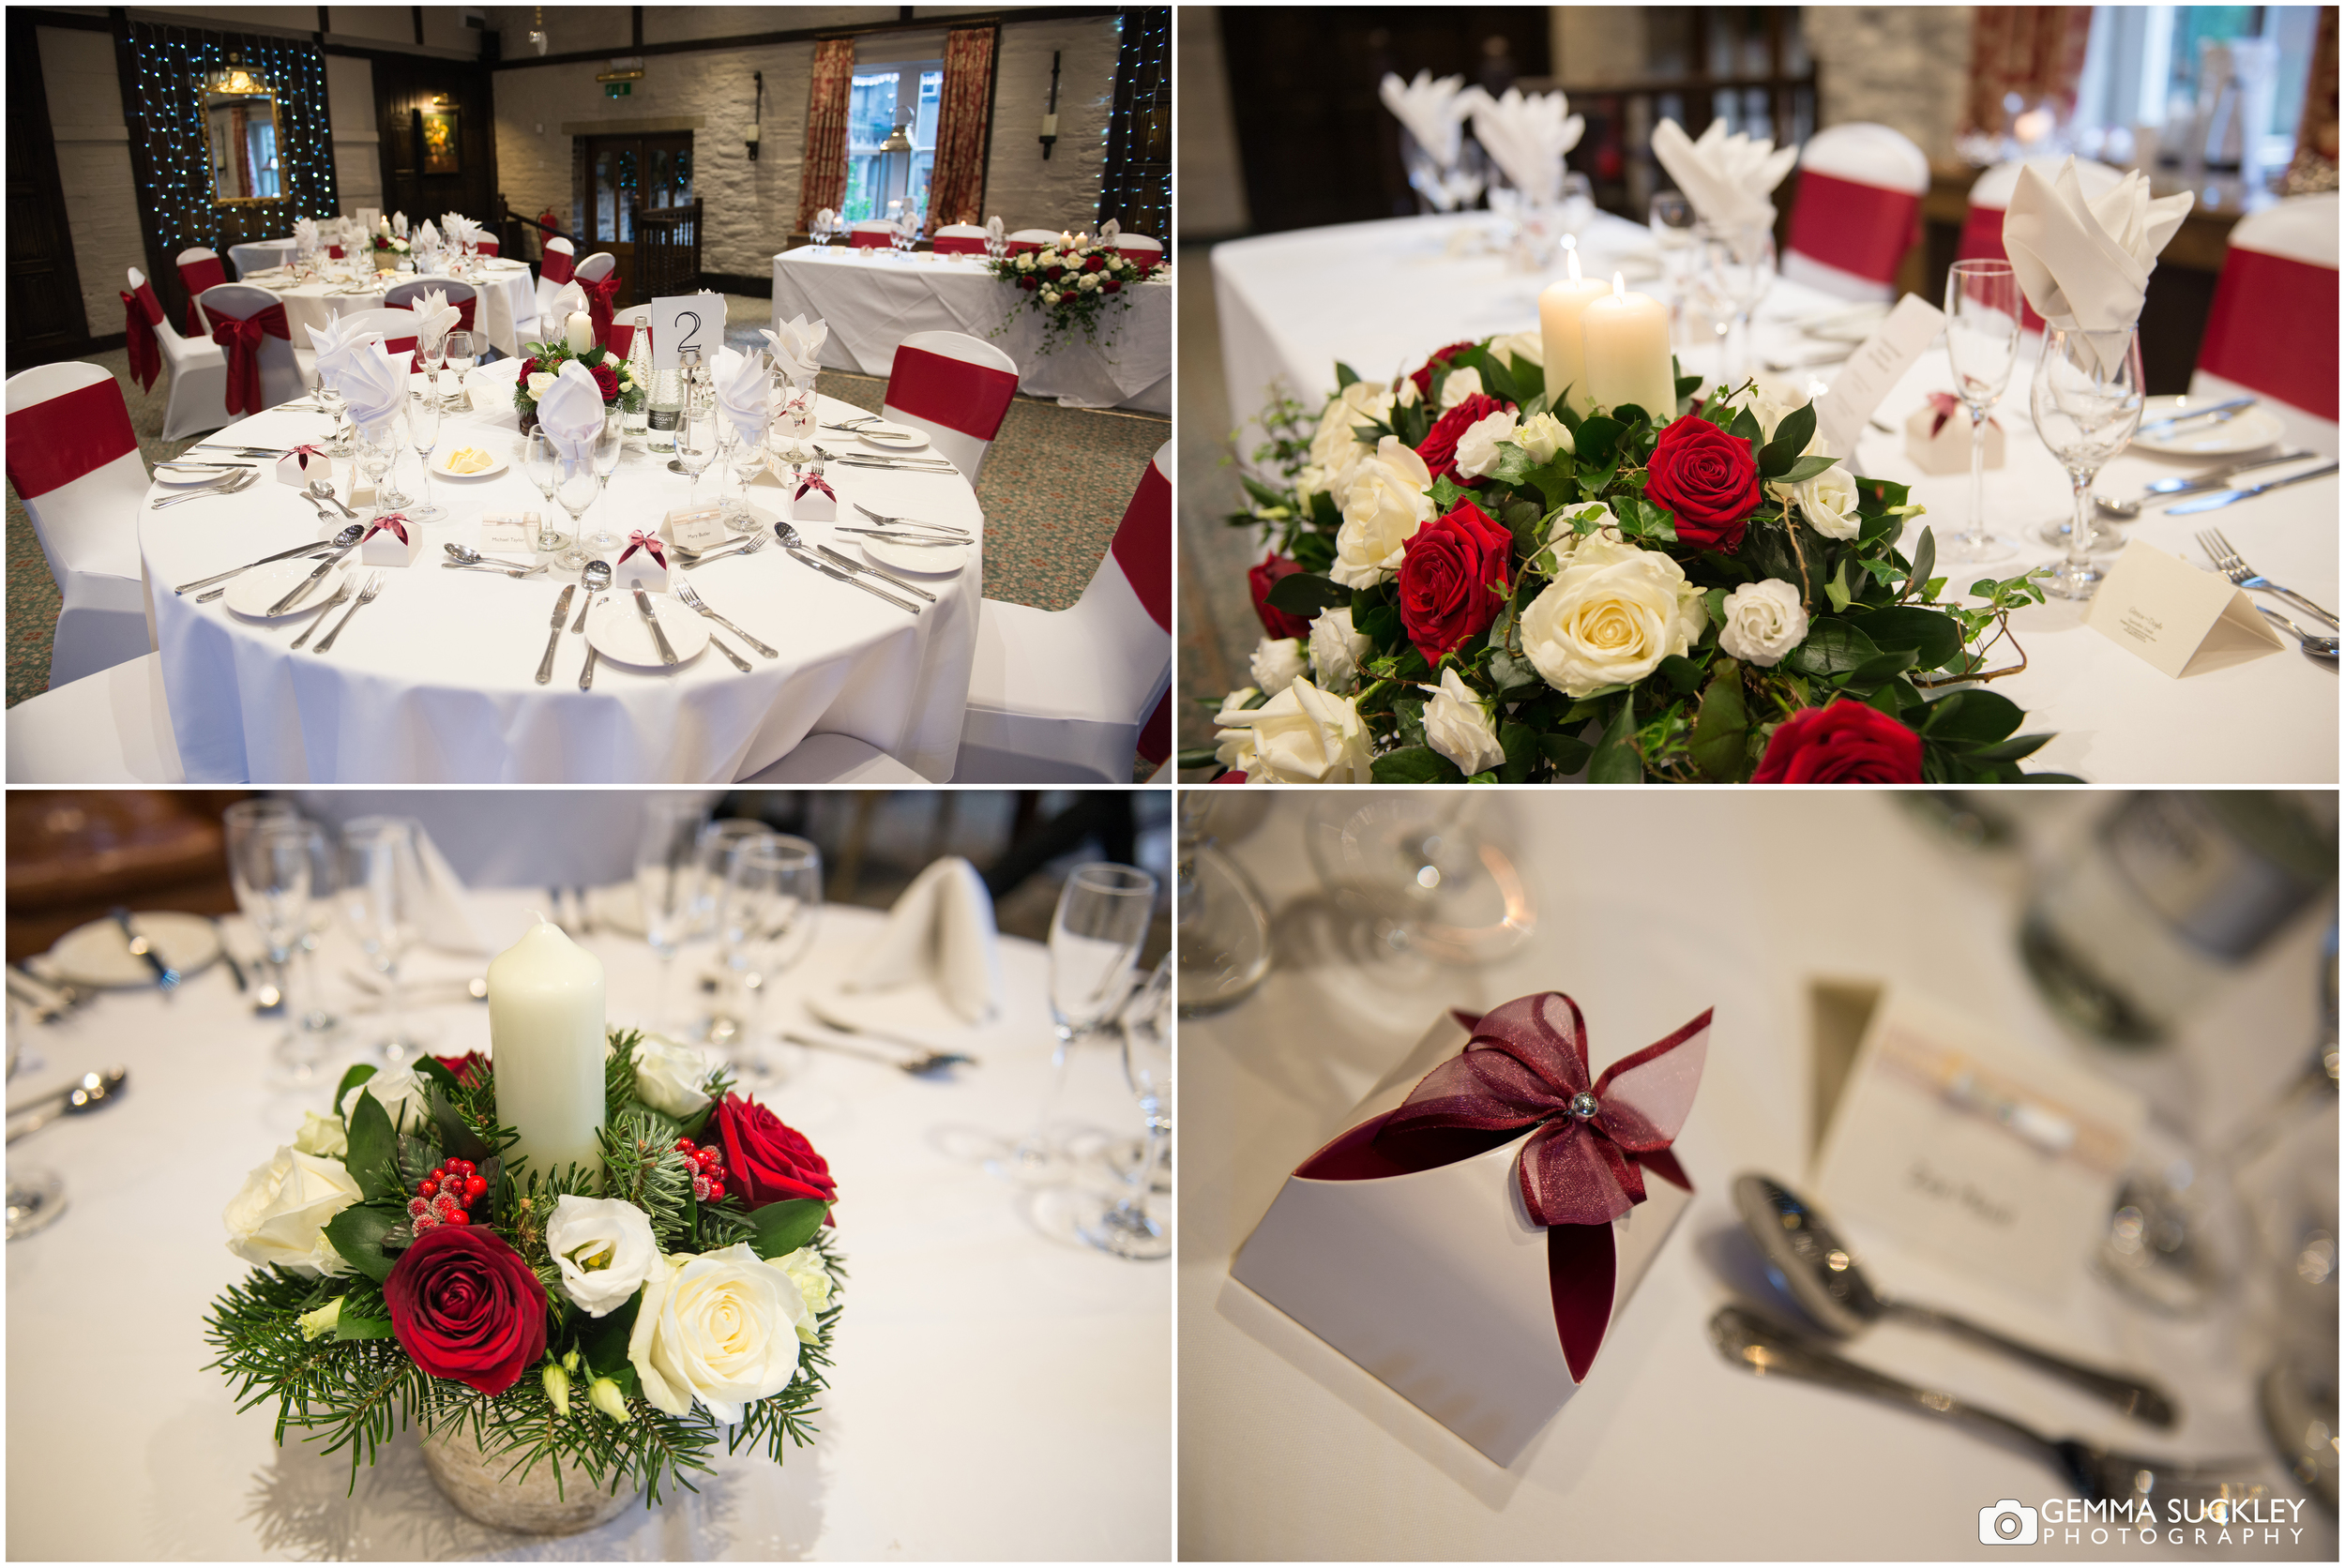 holdsworth-house-wedding-detail.jpg